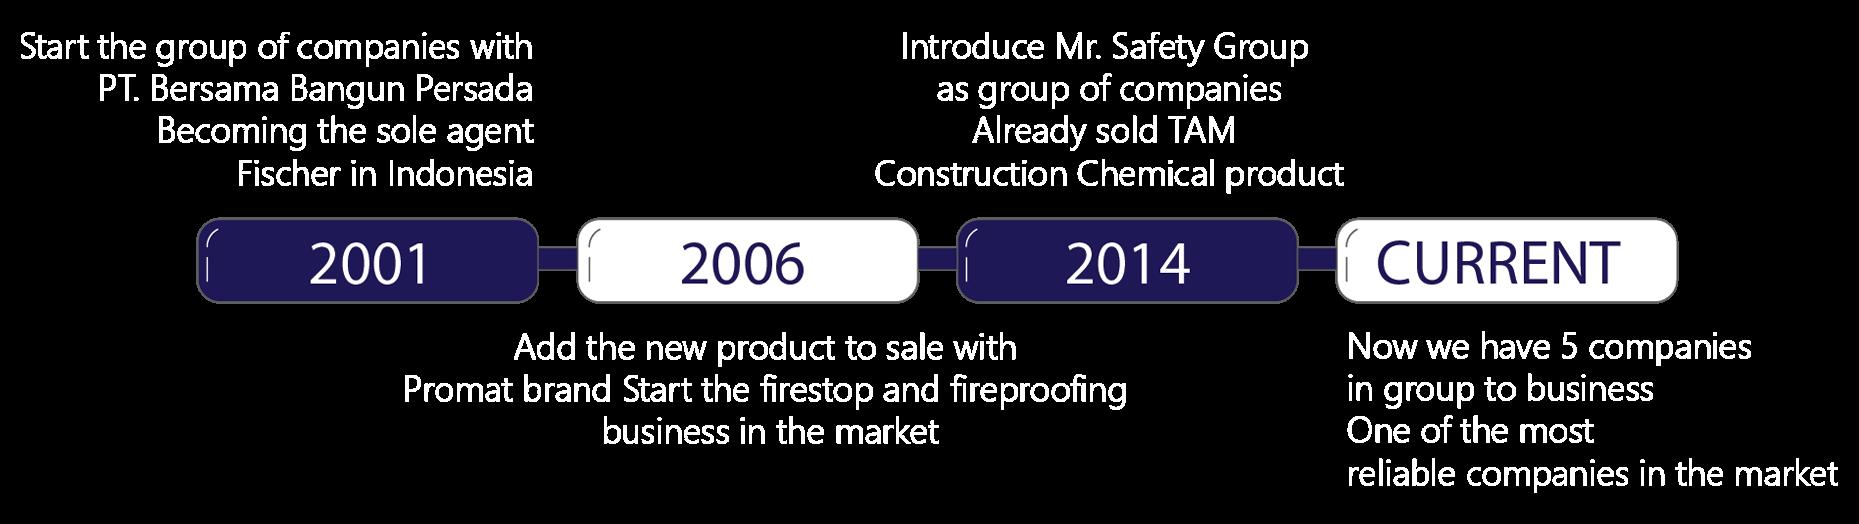 Mrsafetygroup history